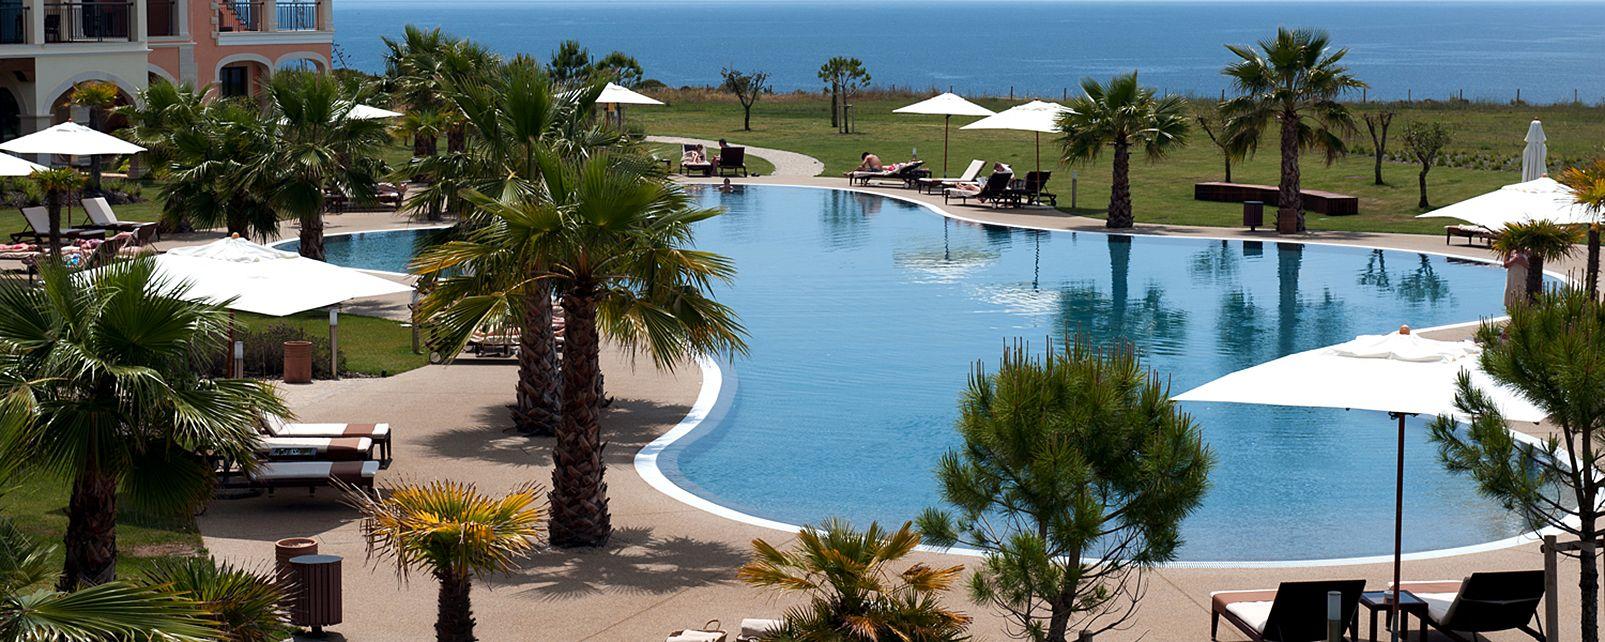 Hotel Cascade Wellness and Lifestyle Resort